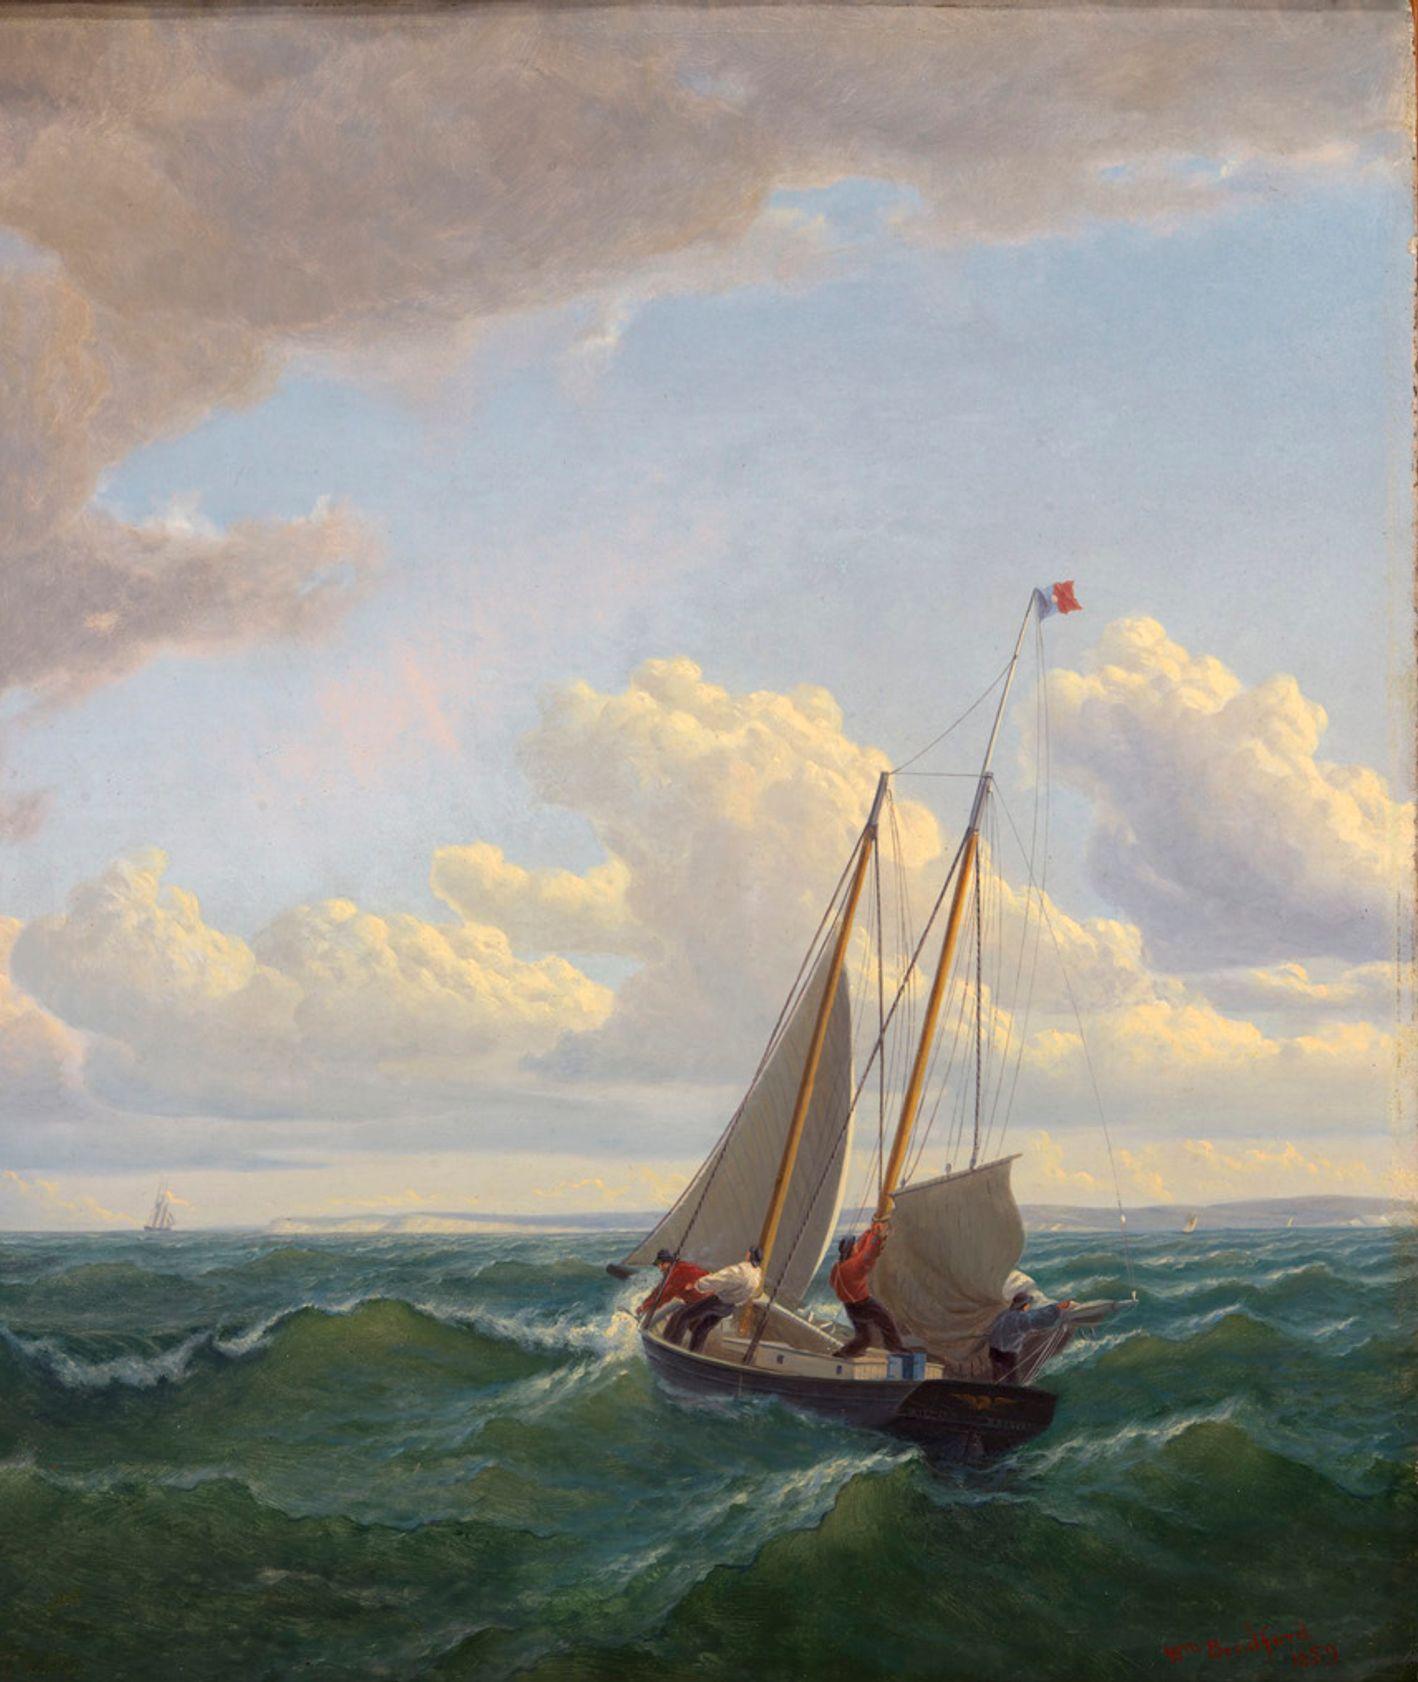 Whaler off the Vineyard–Outward Bound, obraz Williama Bradforda, 1859, Smithsonian American Art Museum, Museum purchase